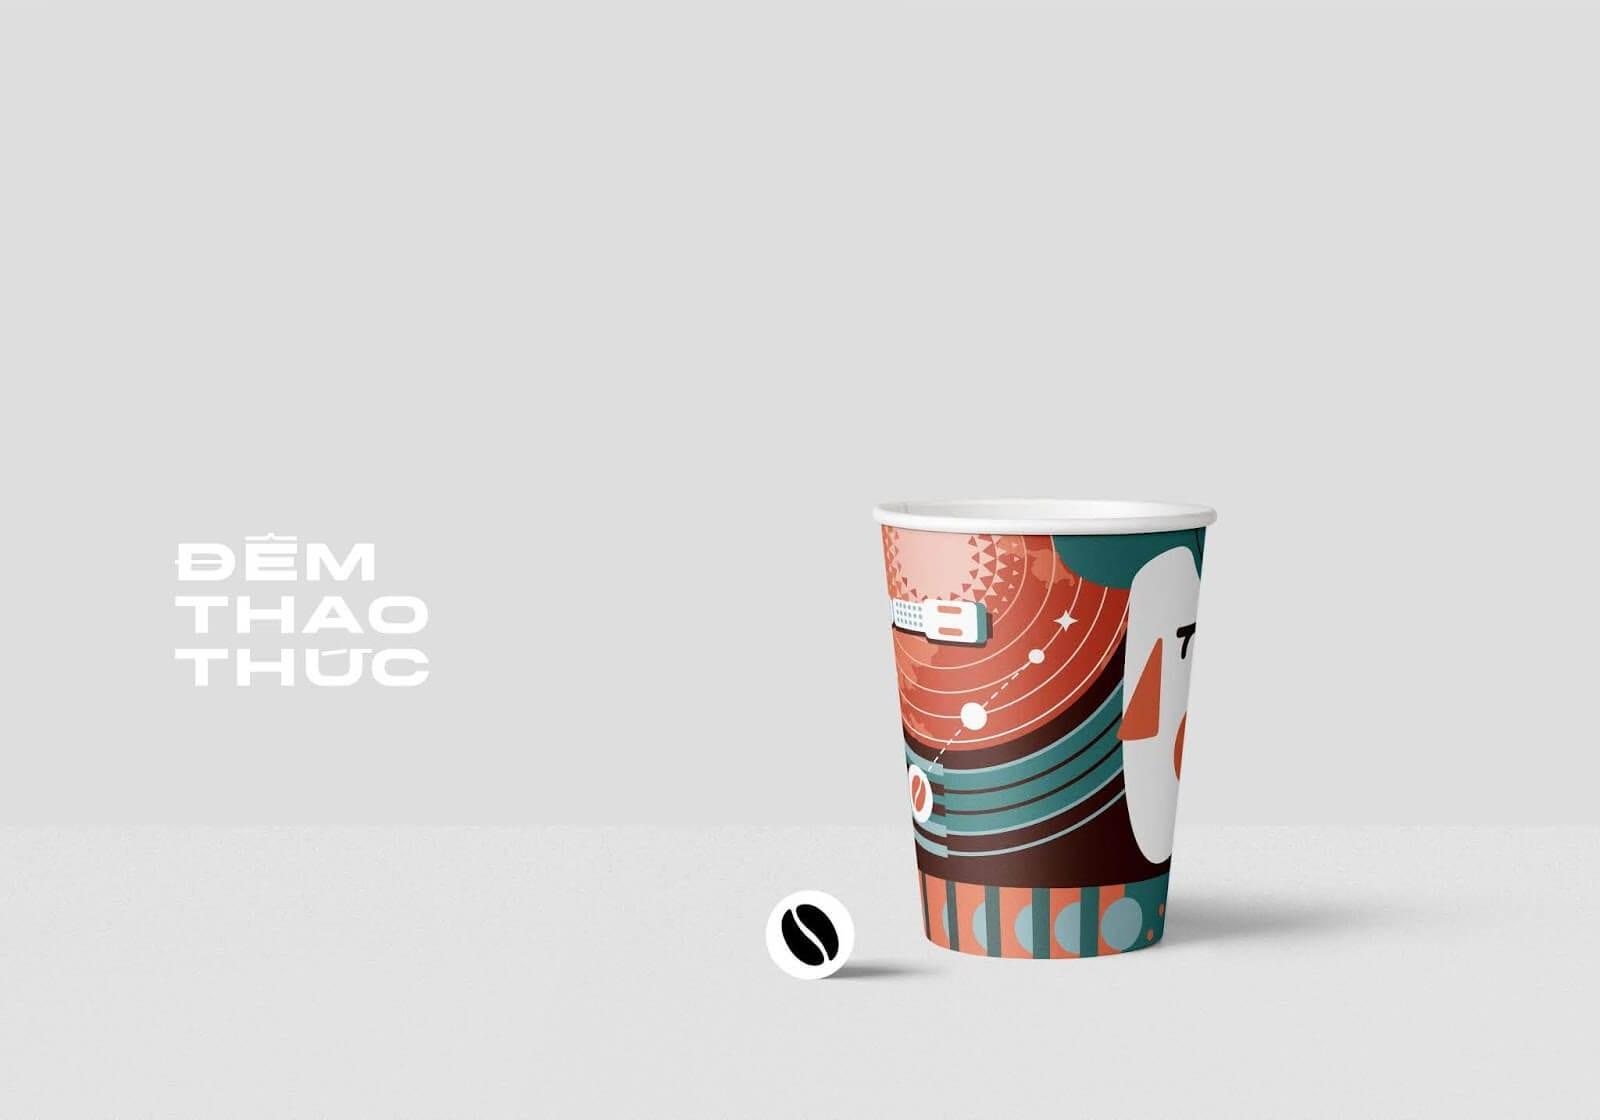 9 submit project tonbui 1 - Ach, tie obaly - Cà phê Việt Nam Vietnam Coffee